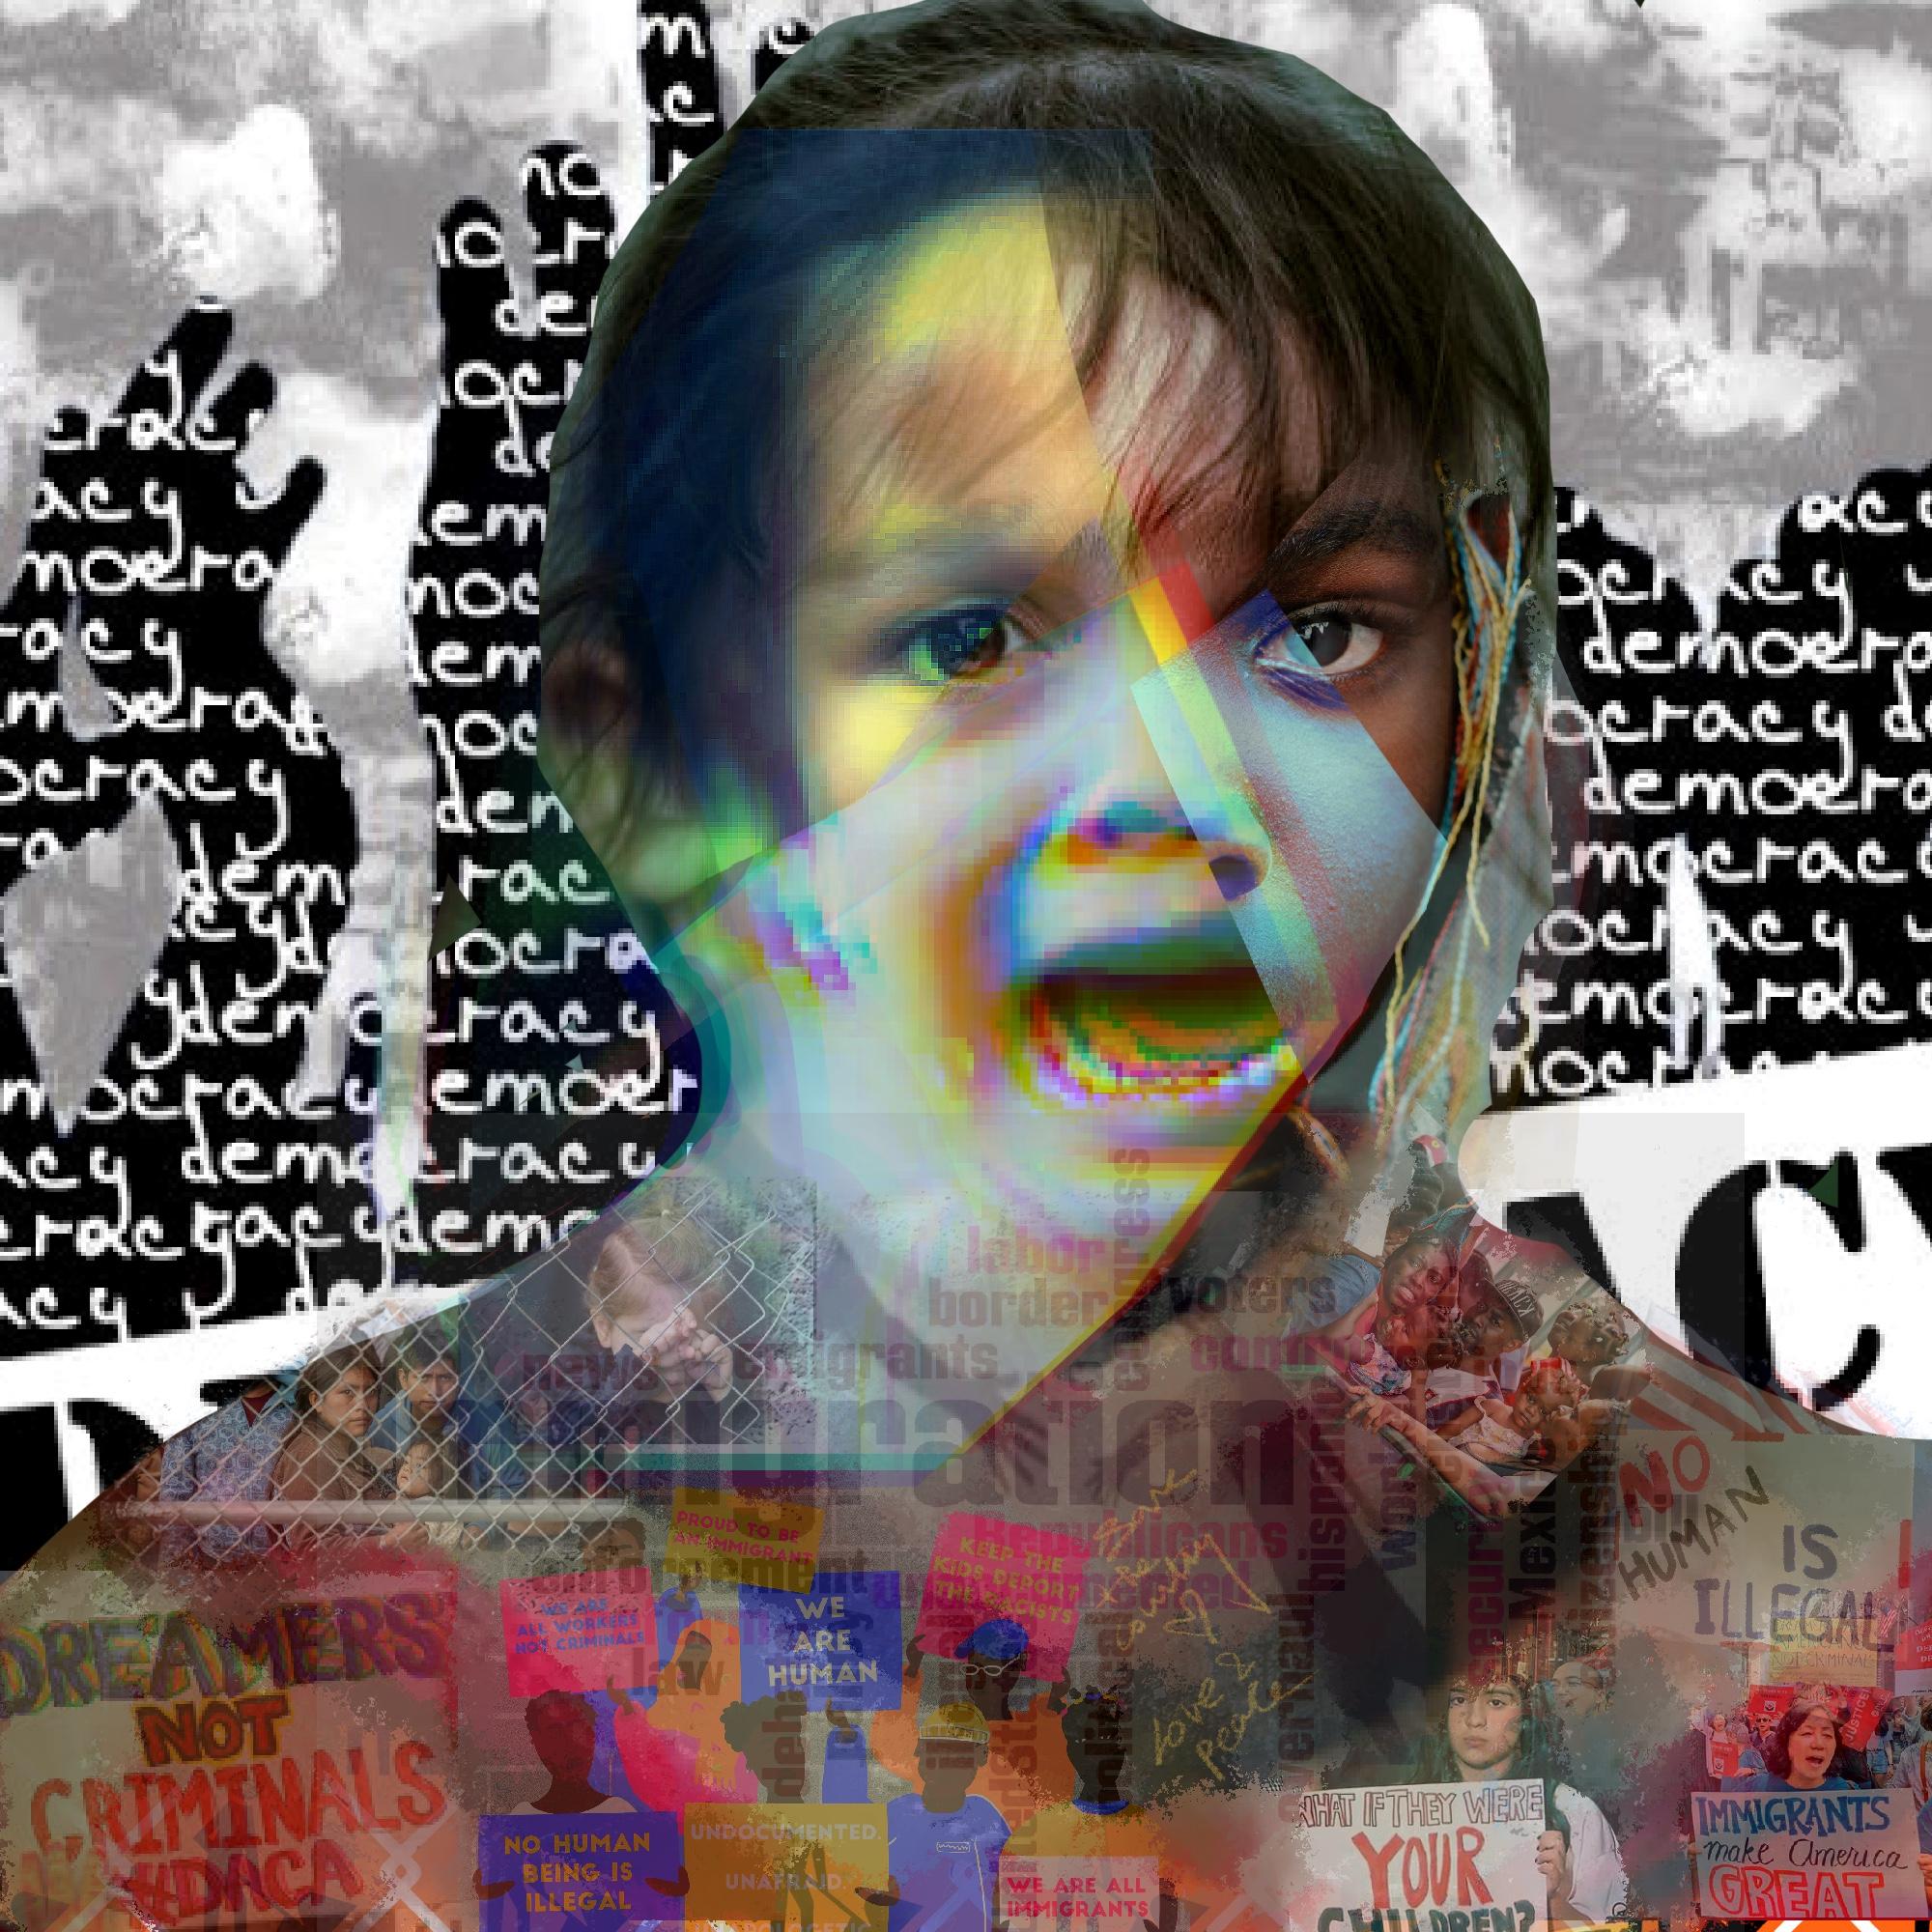 Just a child not a Criminal!